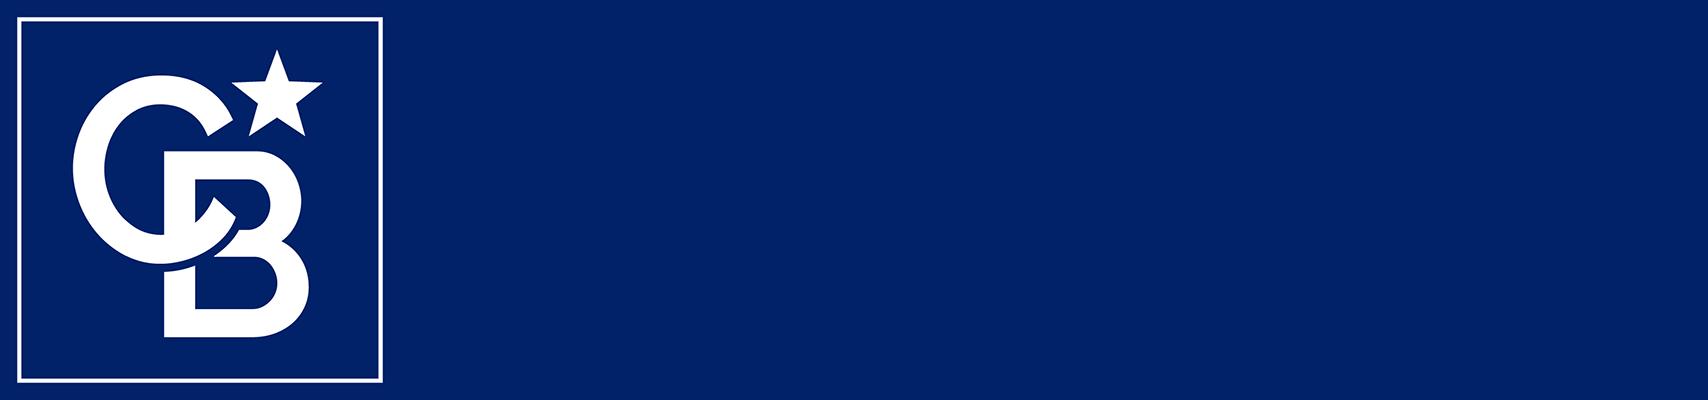 Cathy Sasnett - Coldwell Banker Select Logo